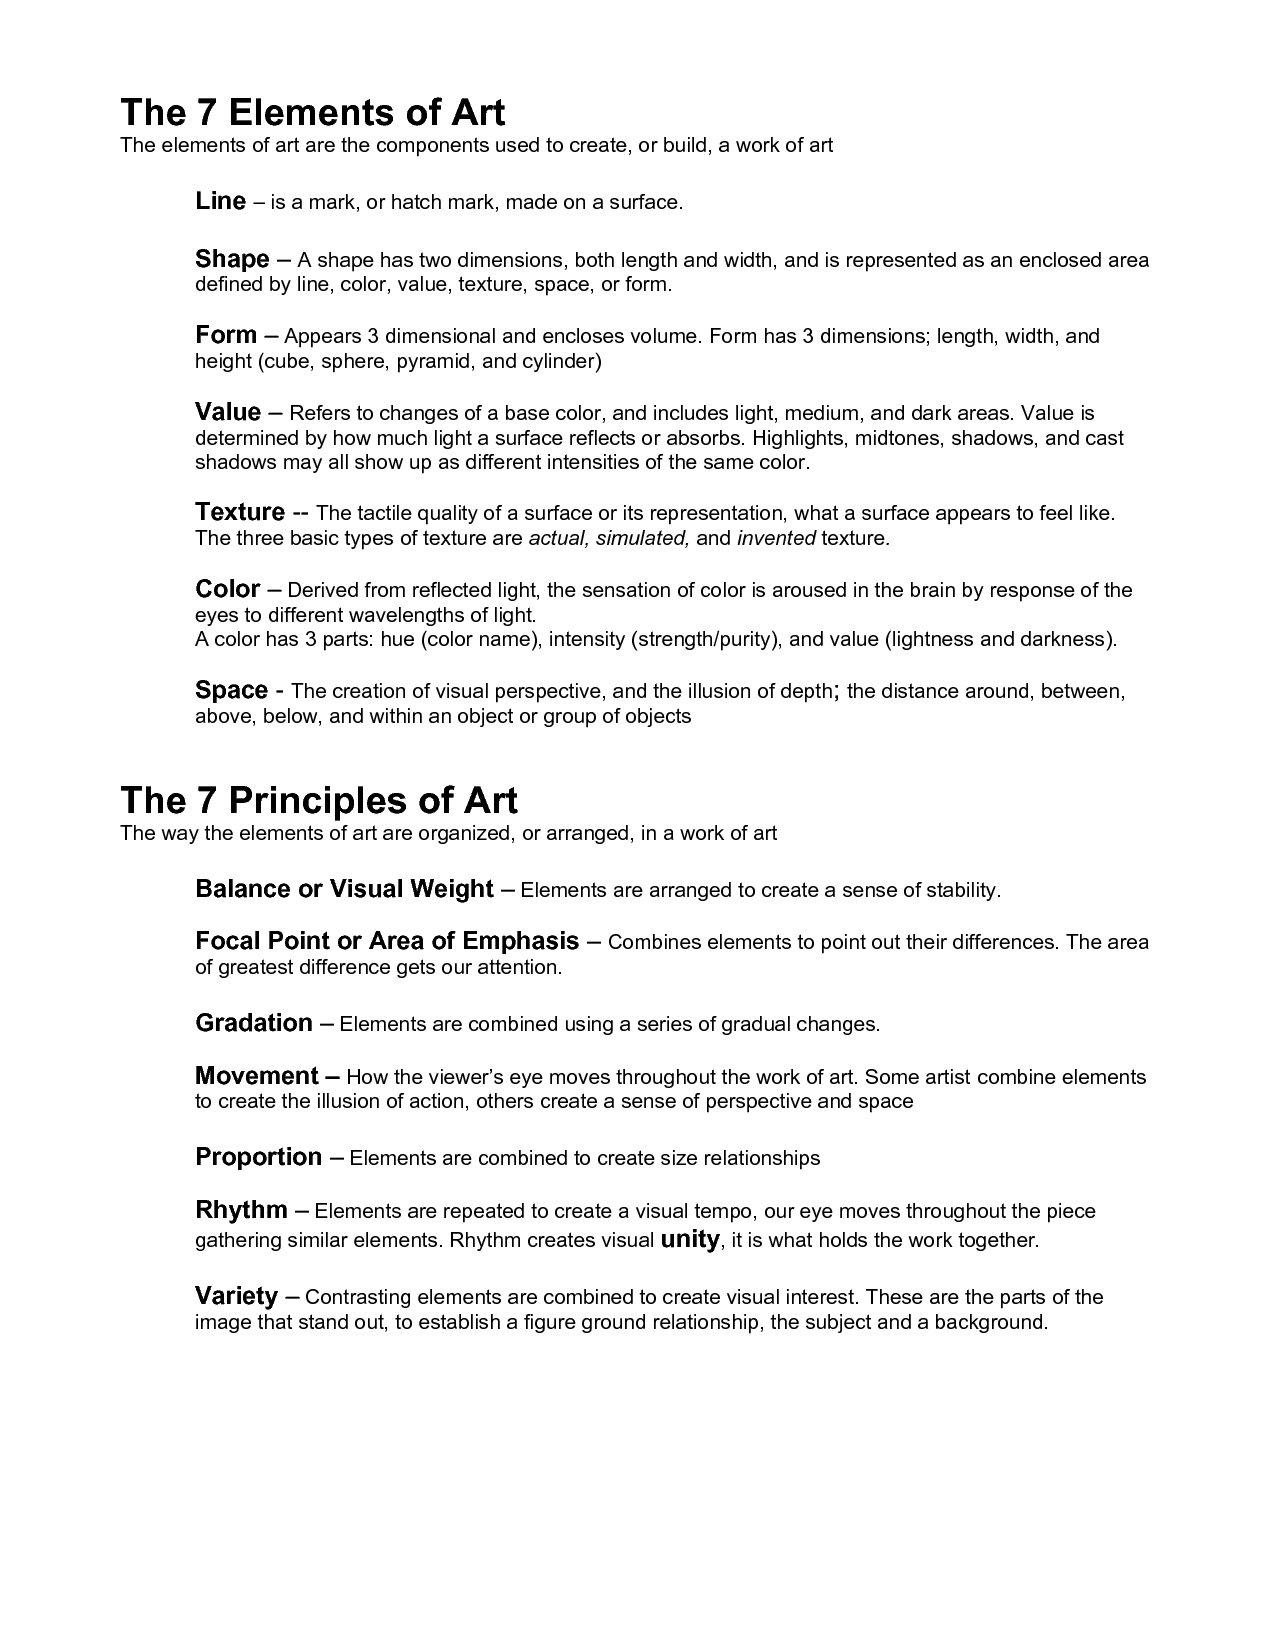 elements of design | elements of art | analysis | pinterest | design